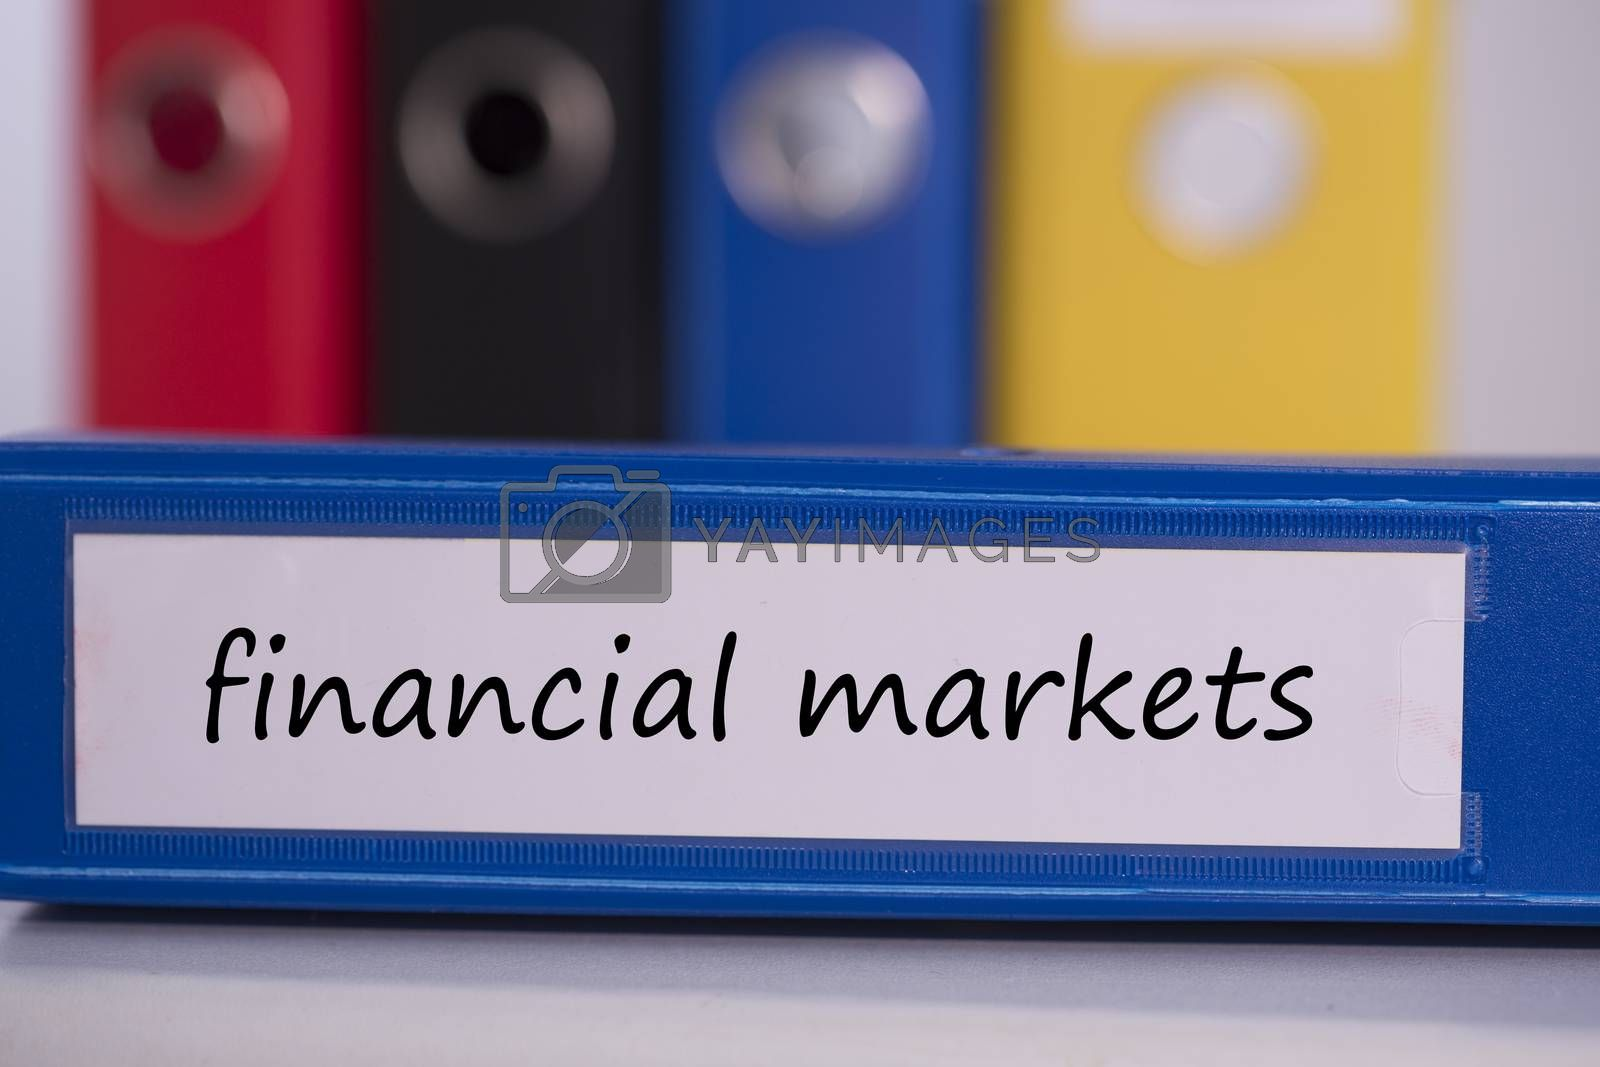 Financial markets on blue business binder by Wavebreakmedia